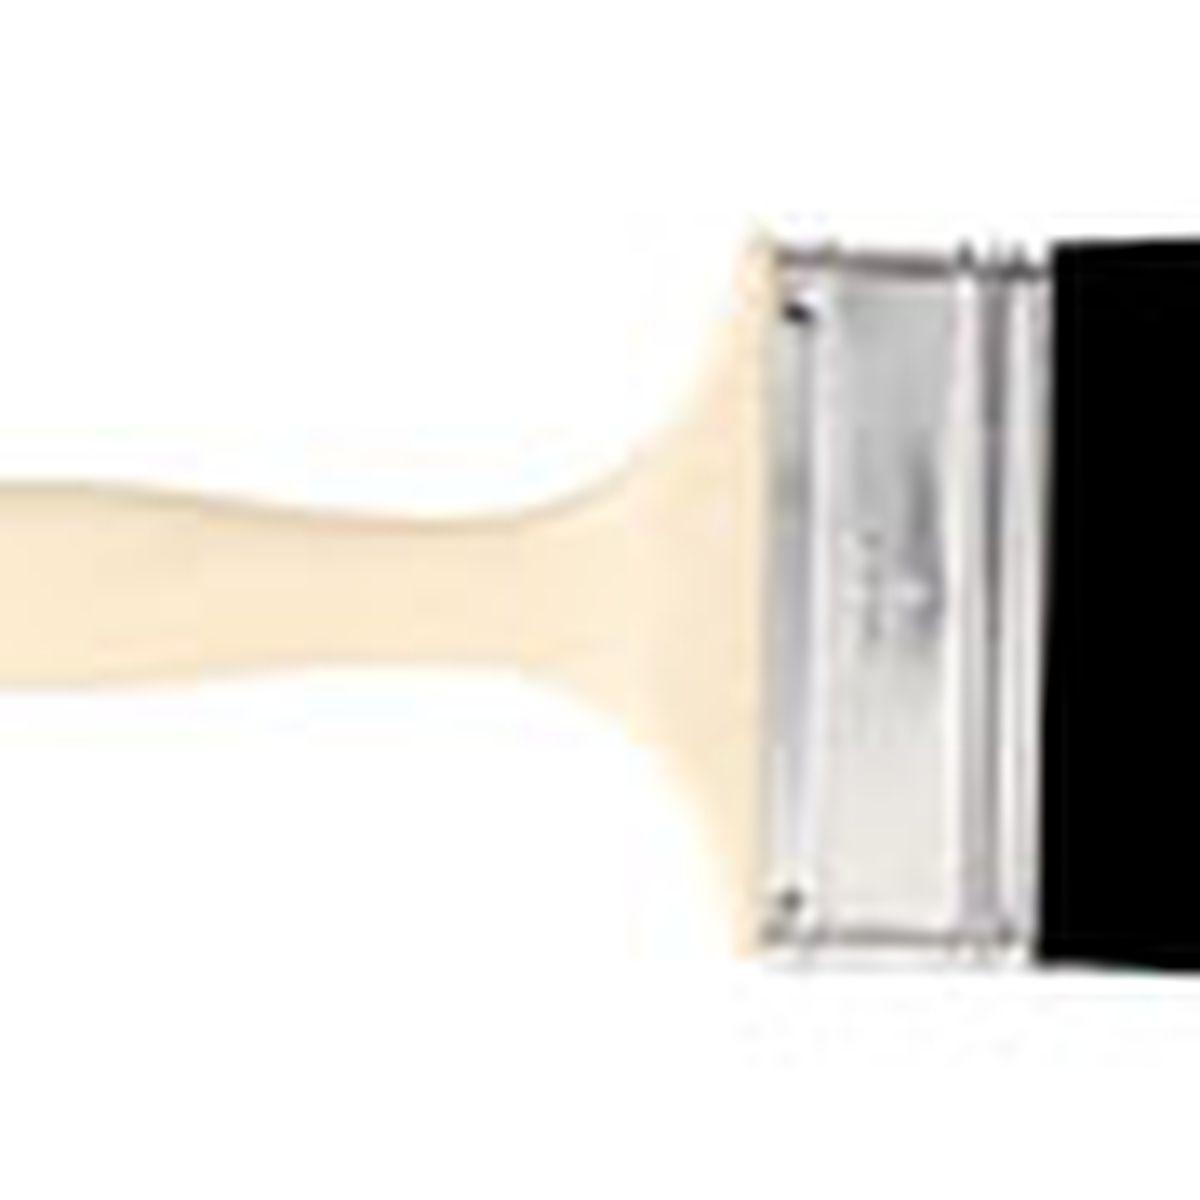 4-inch paintbrush